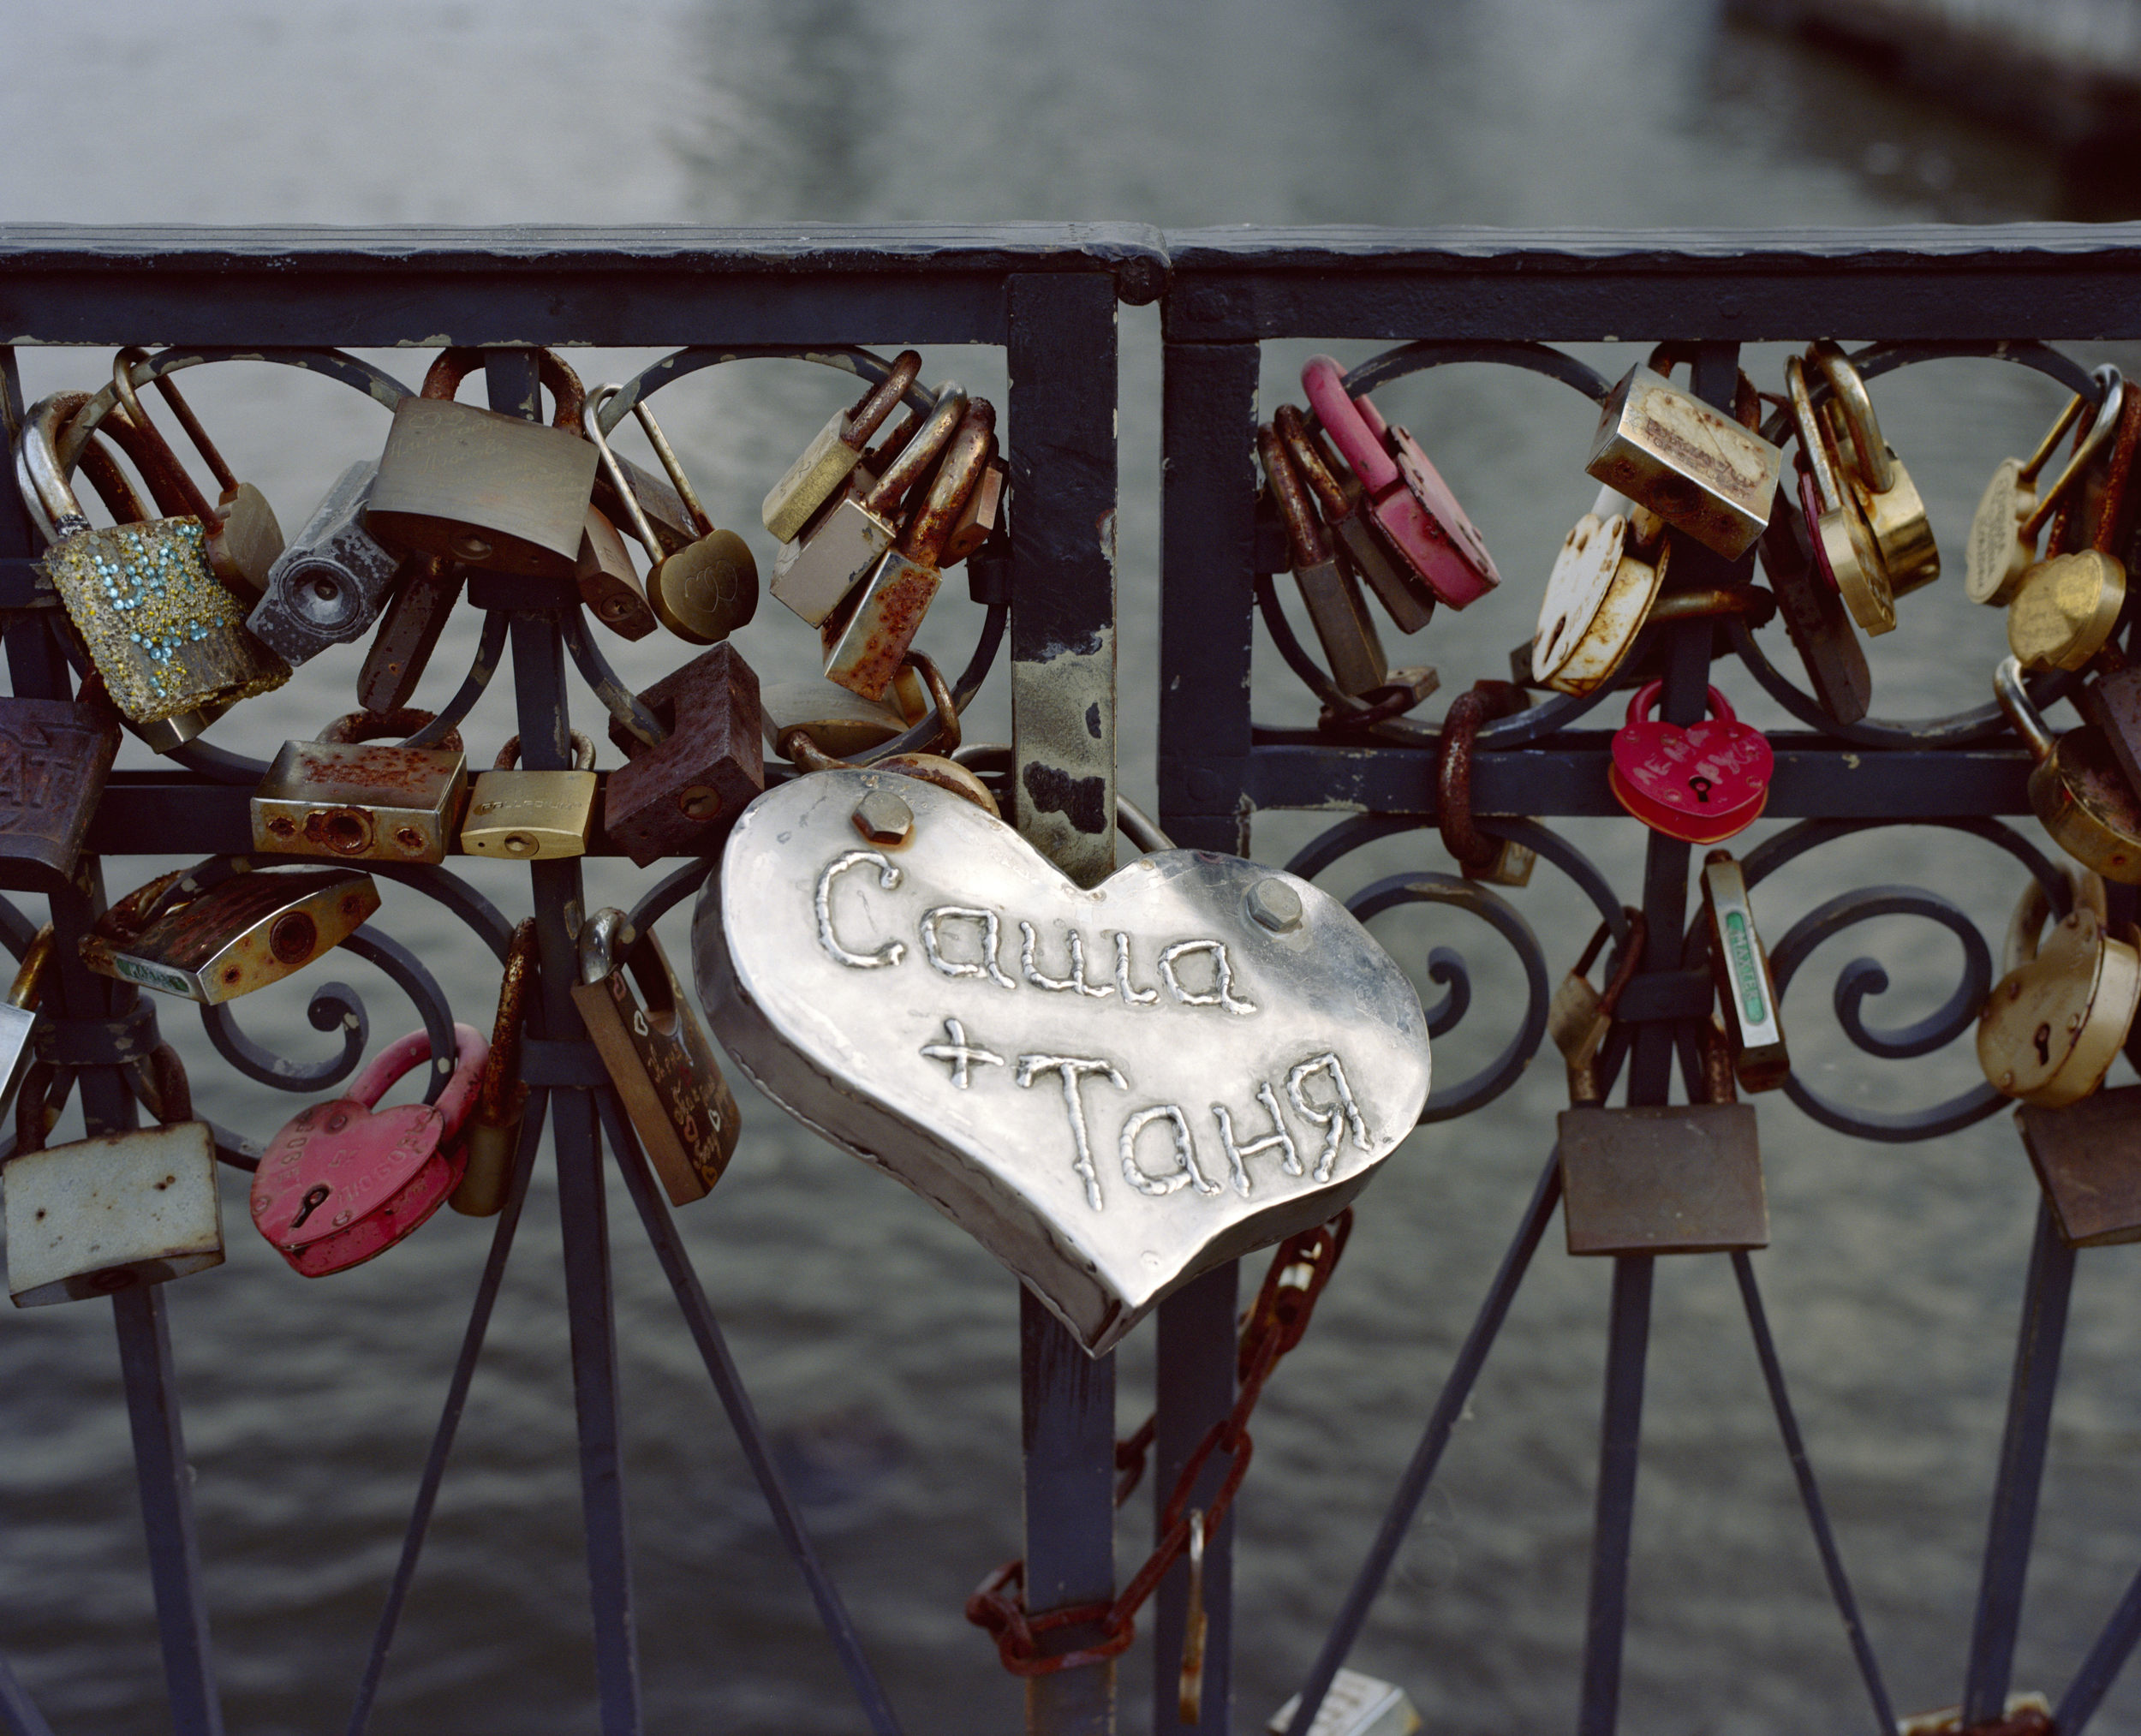 Bridge of love, Kaliningrad